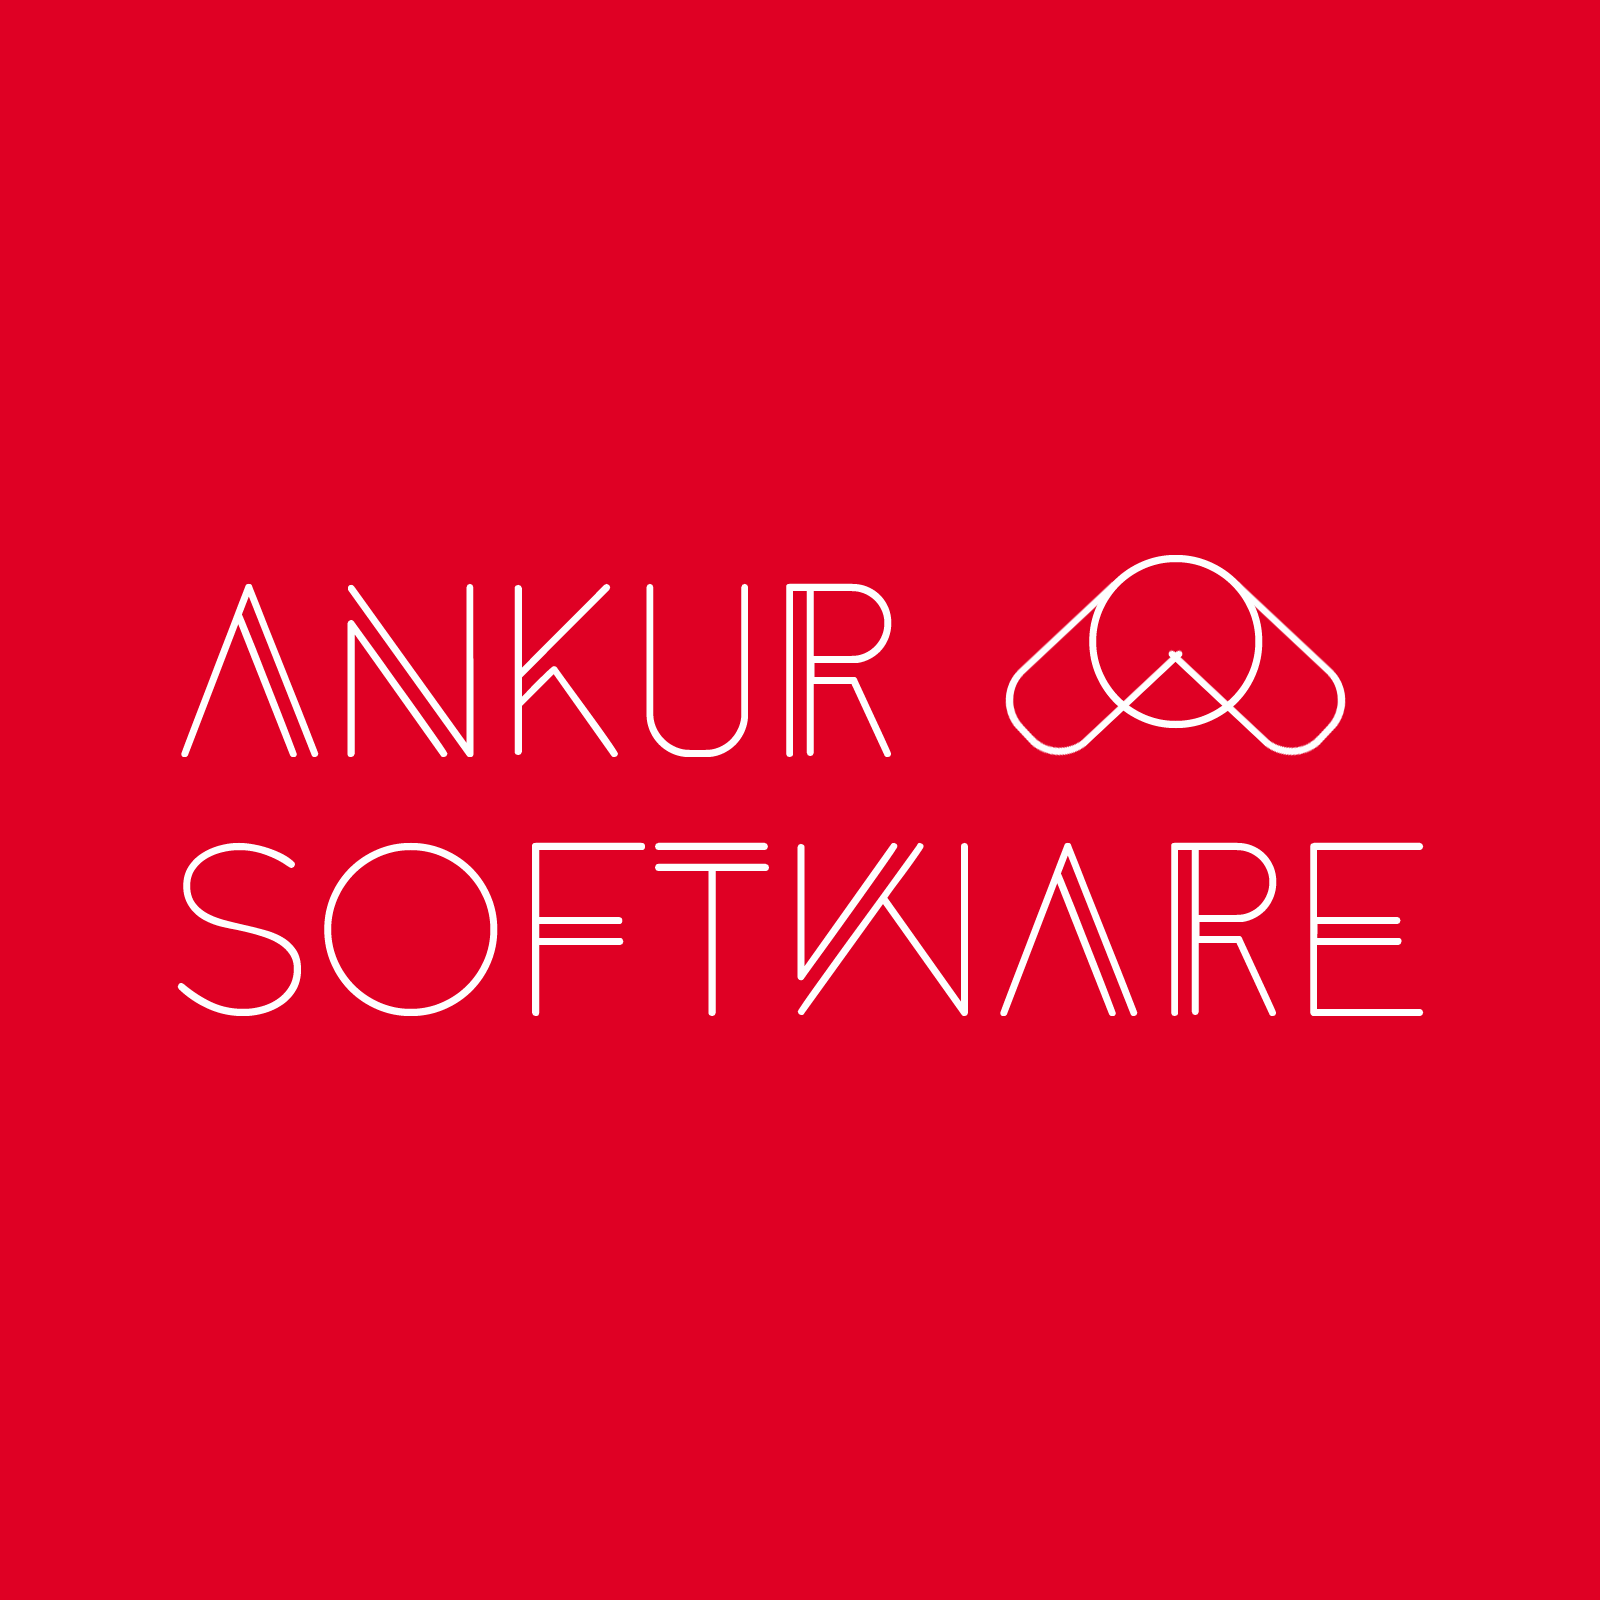 Ankur Software